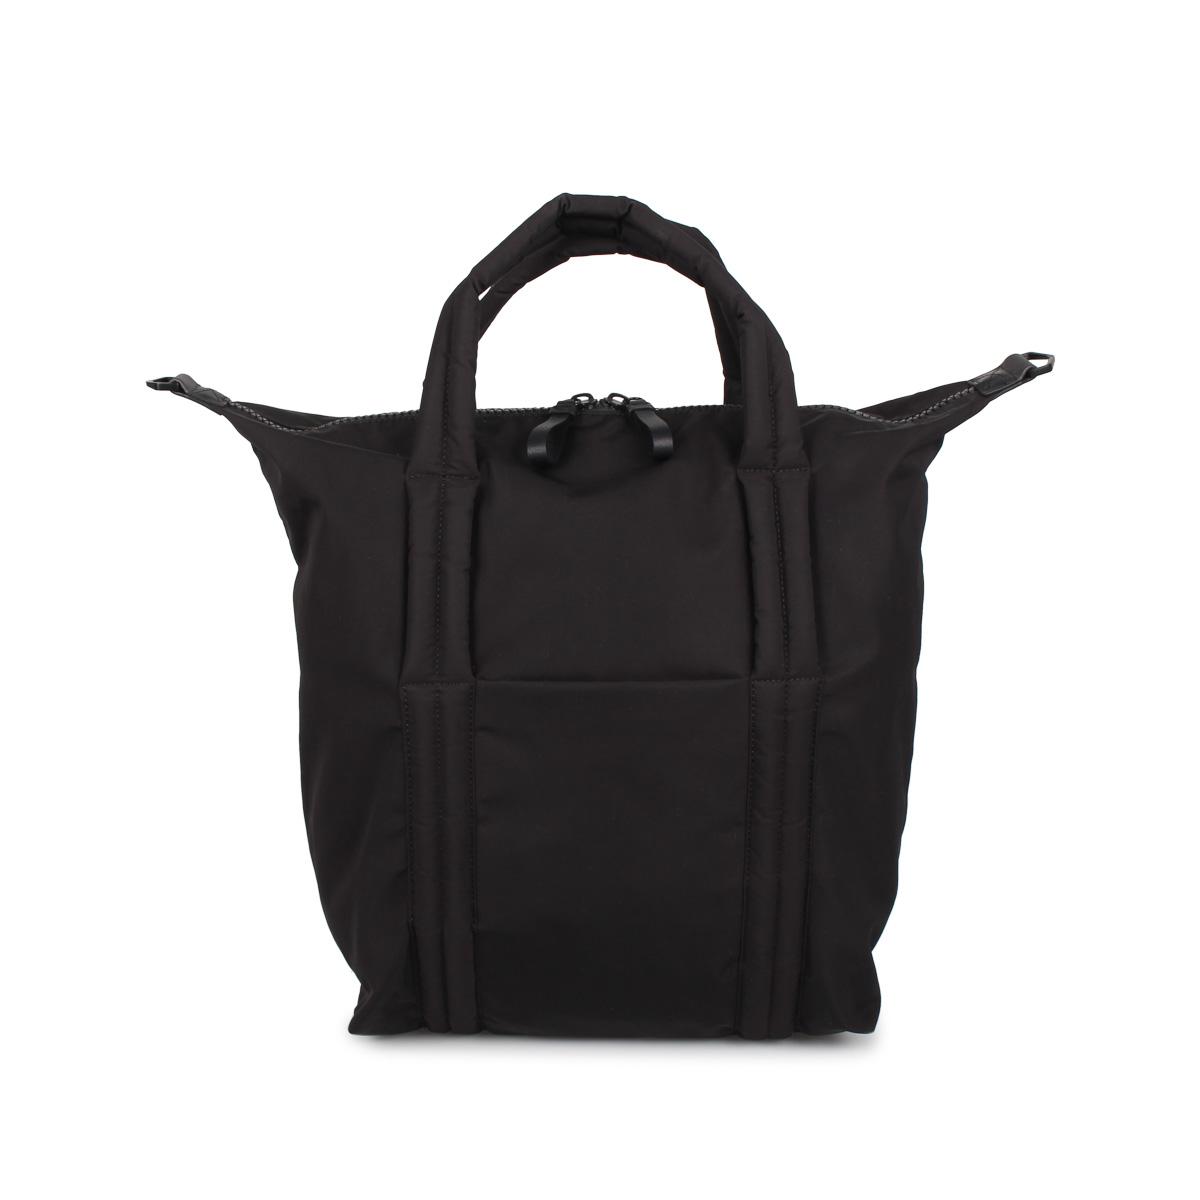 MAISON MARGIELA TOTE BAG メゾンマルジェラ バッグ トートバッグ ショルダー メンズ レディース ブラック 黒 S55WC0059-T8013 [3/9 新入荷]